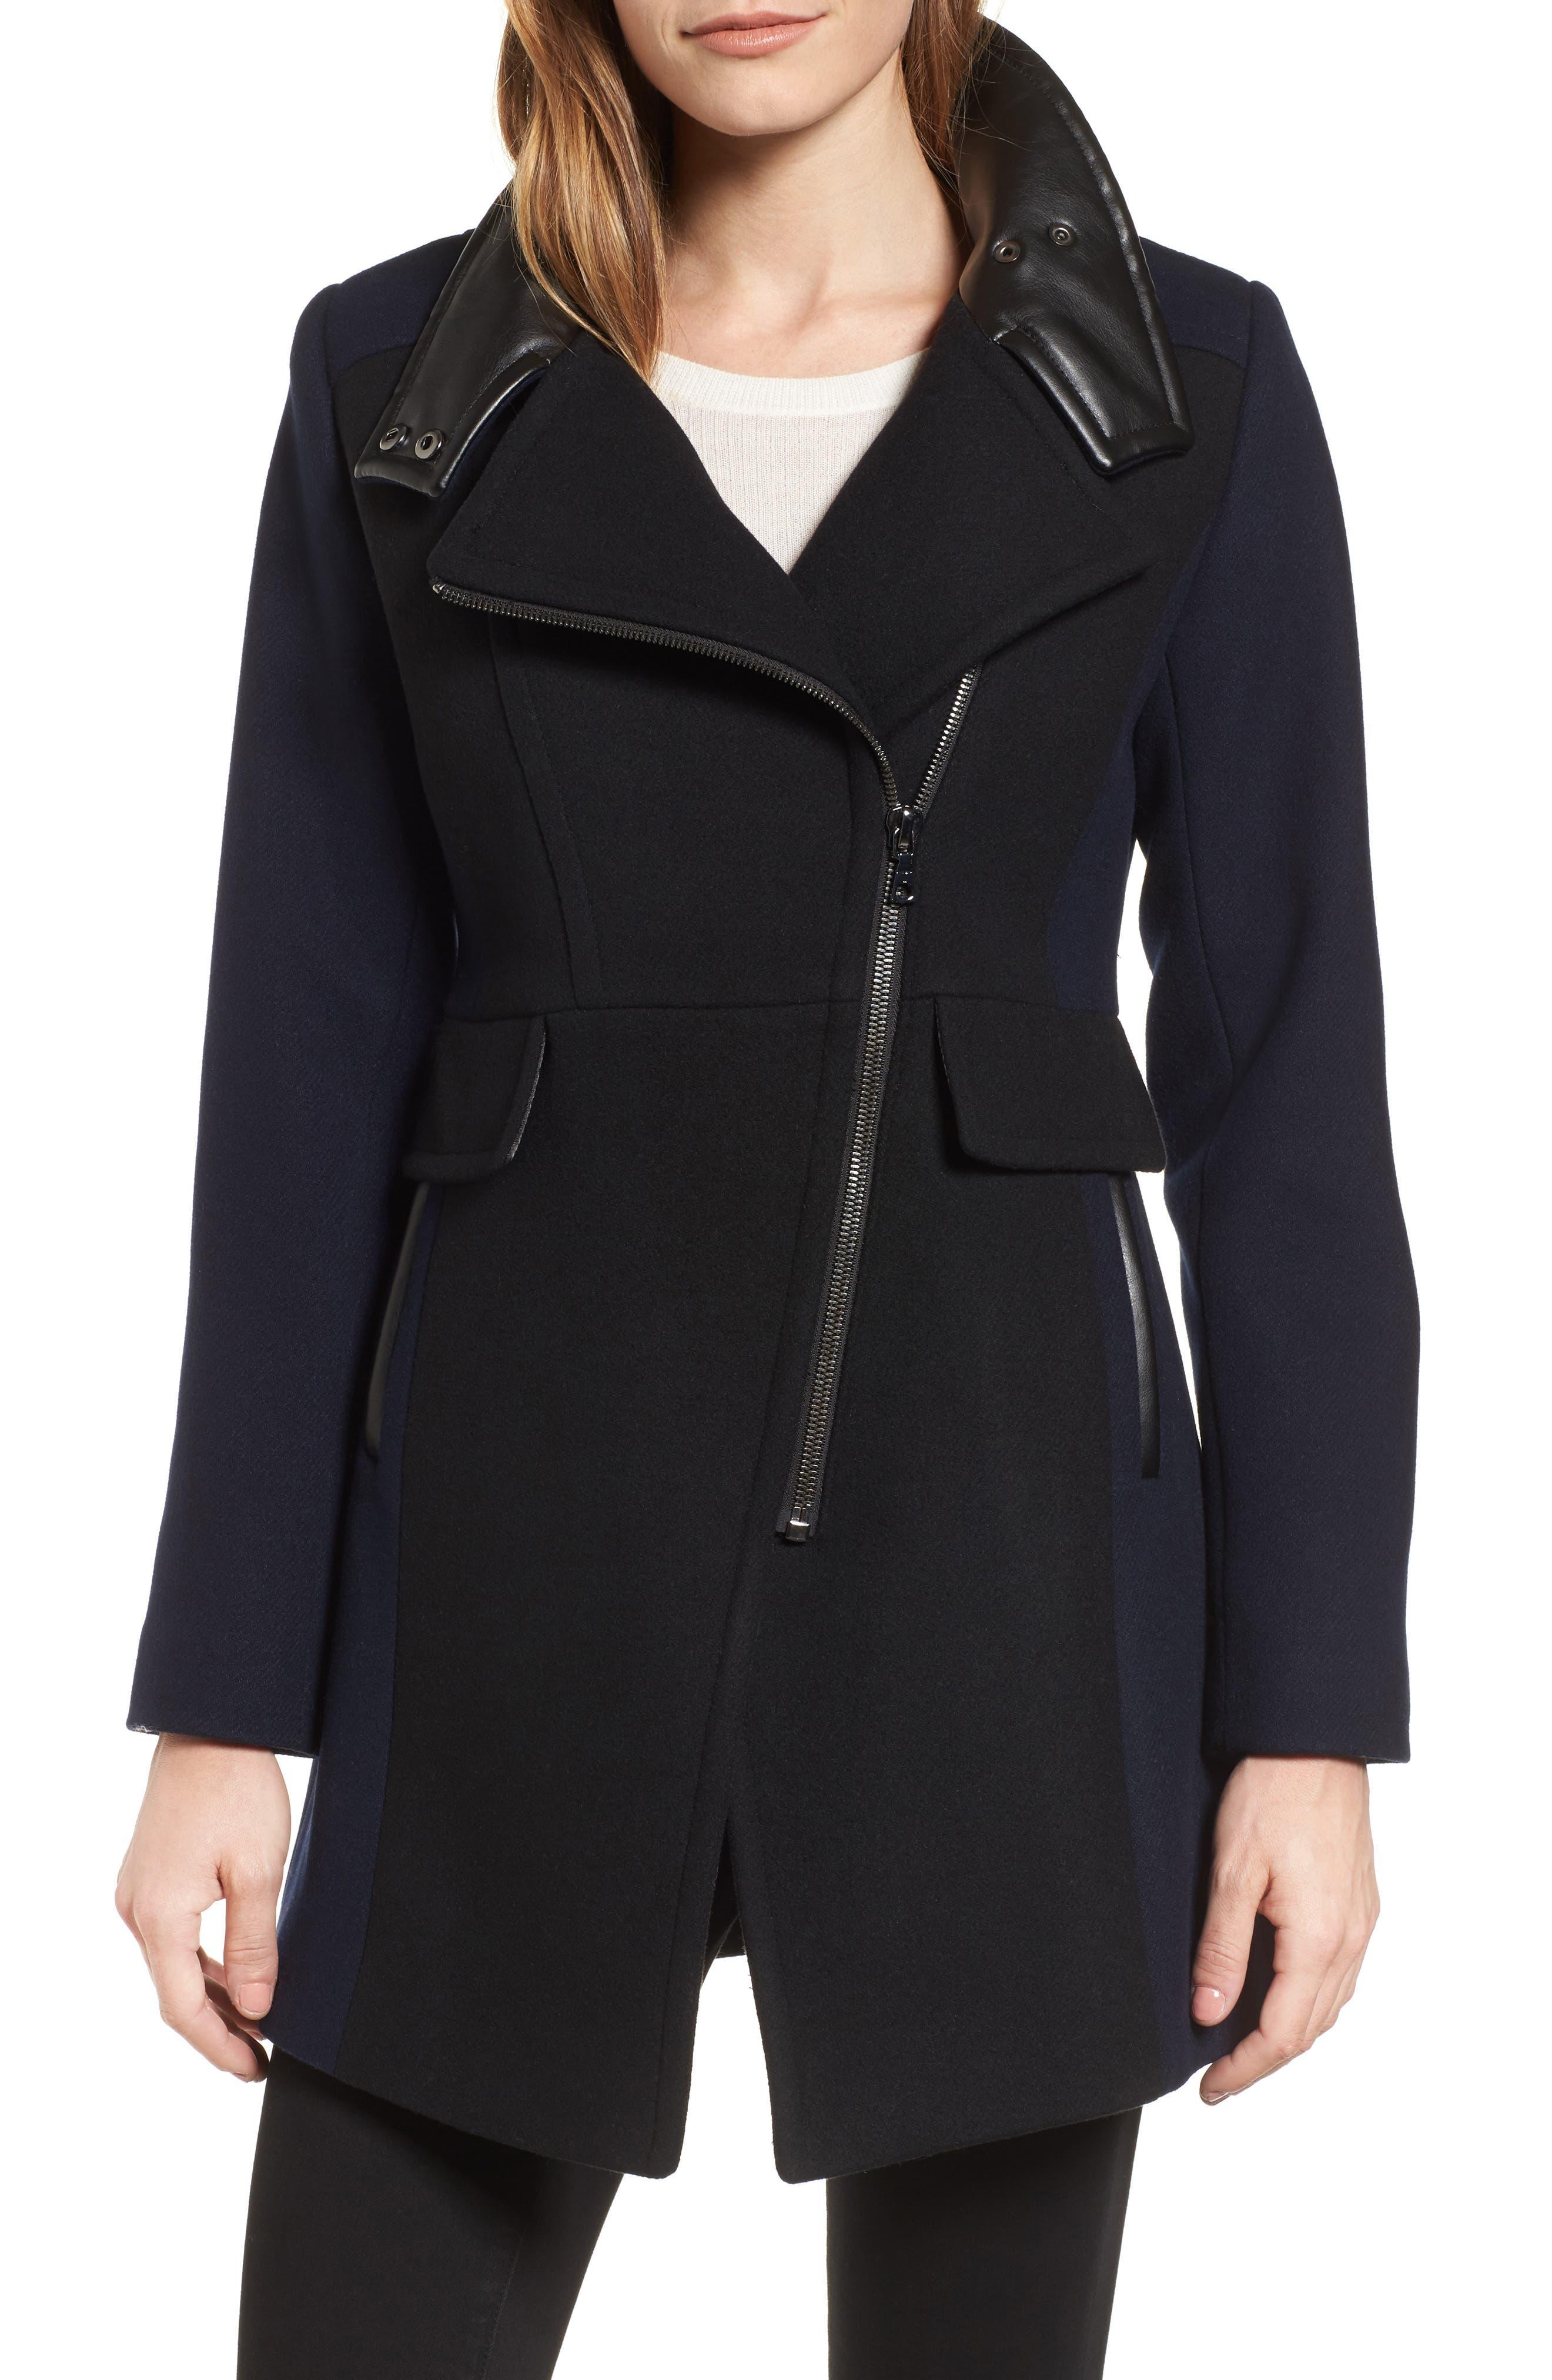 Eleanor Leather Trim Wool Blend Coat,                         Main,                         color, Black/ Navy